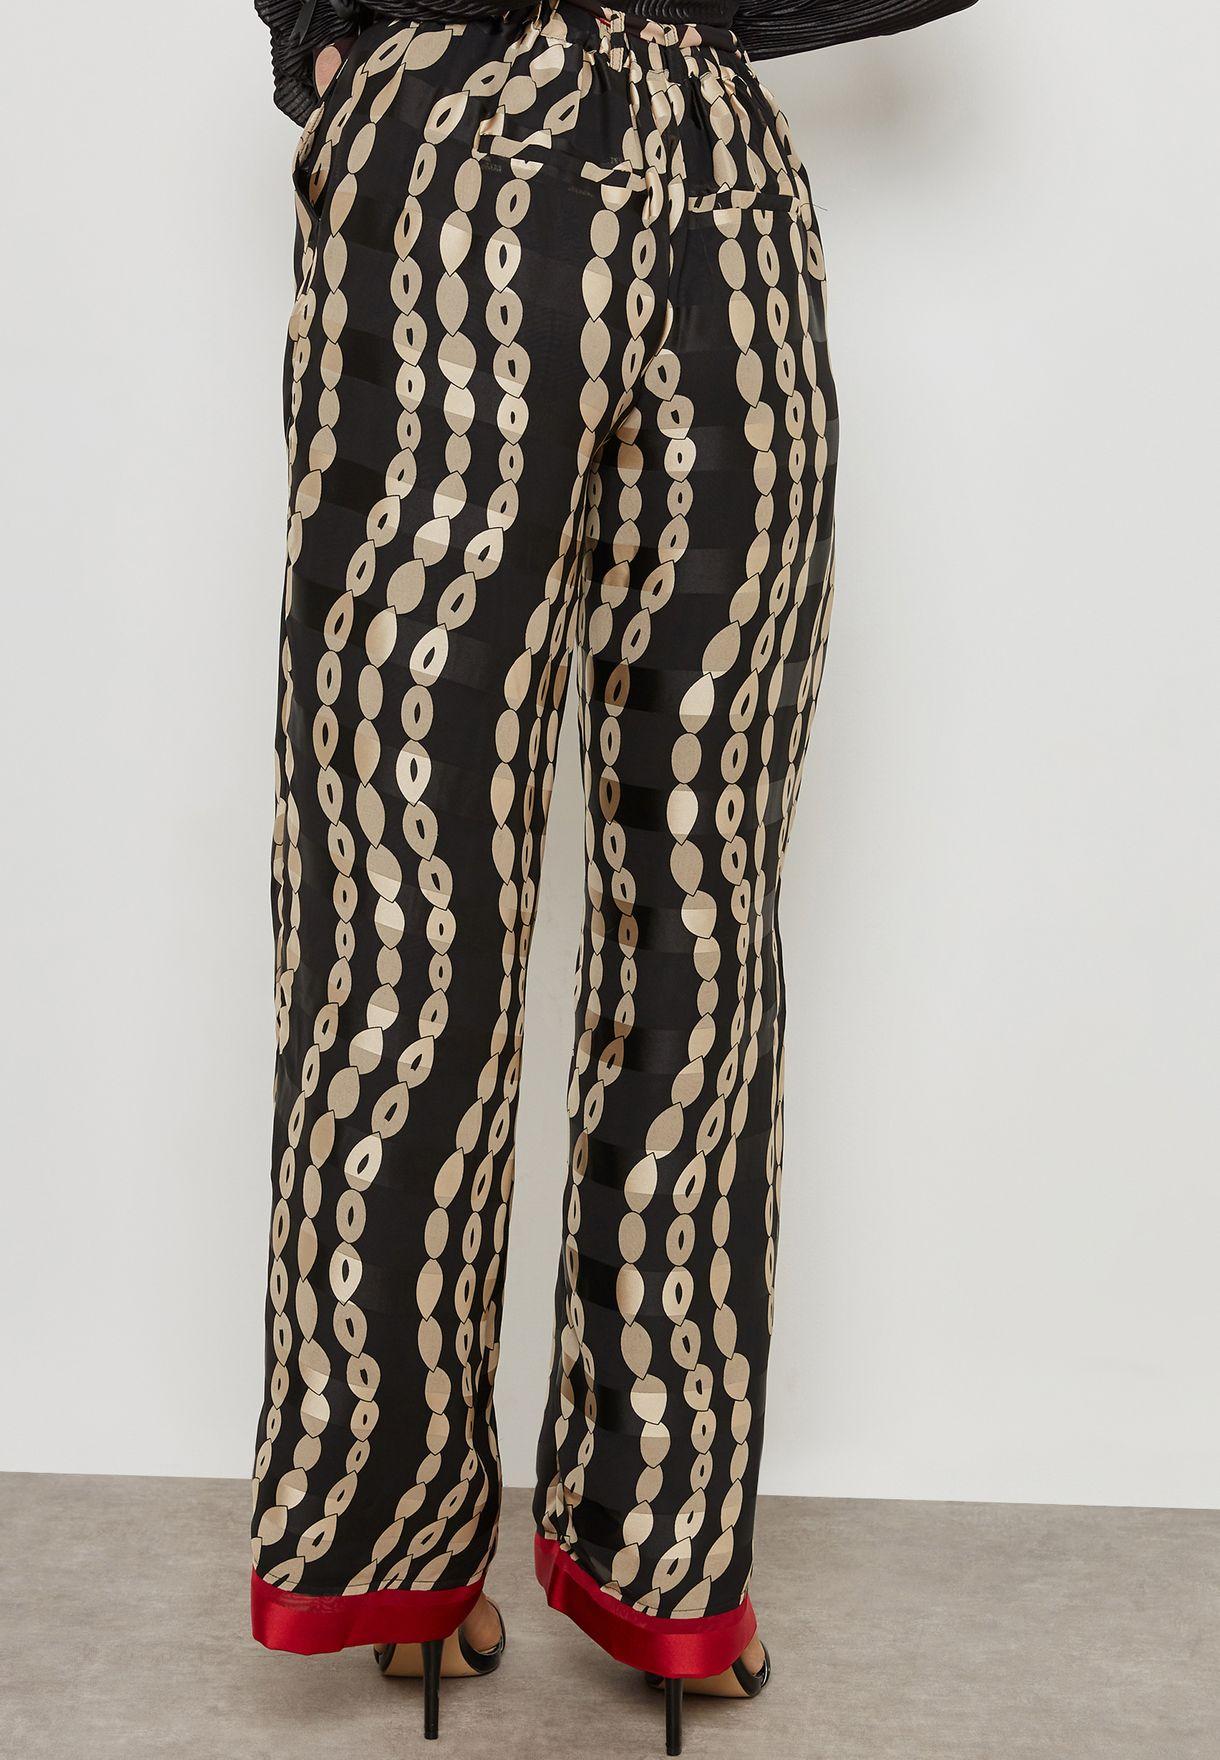 Buy Yas Prints Contrast Band Printed Pants For Women, Uae Ya500at19tyq